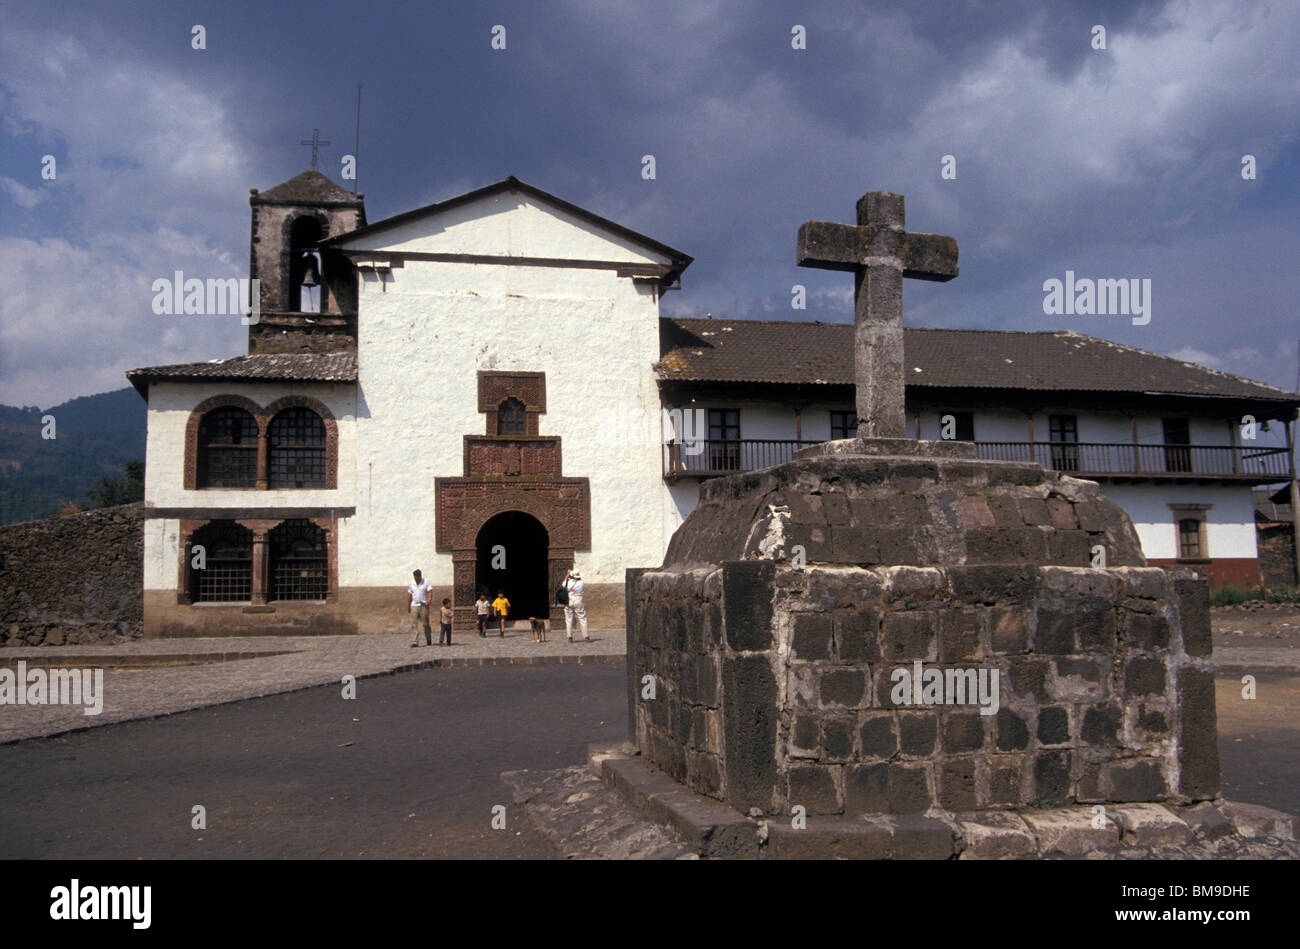 The 16th-century Iglesia de Santiago Apostol in the village of Angahuan, Michoacan, Mexico - Stock Image